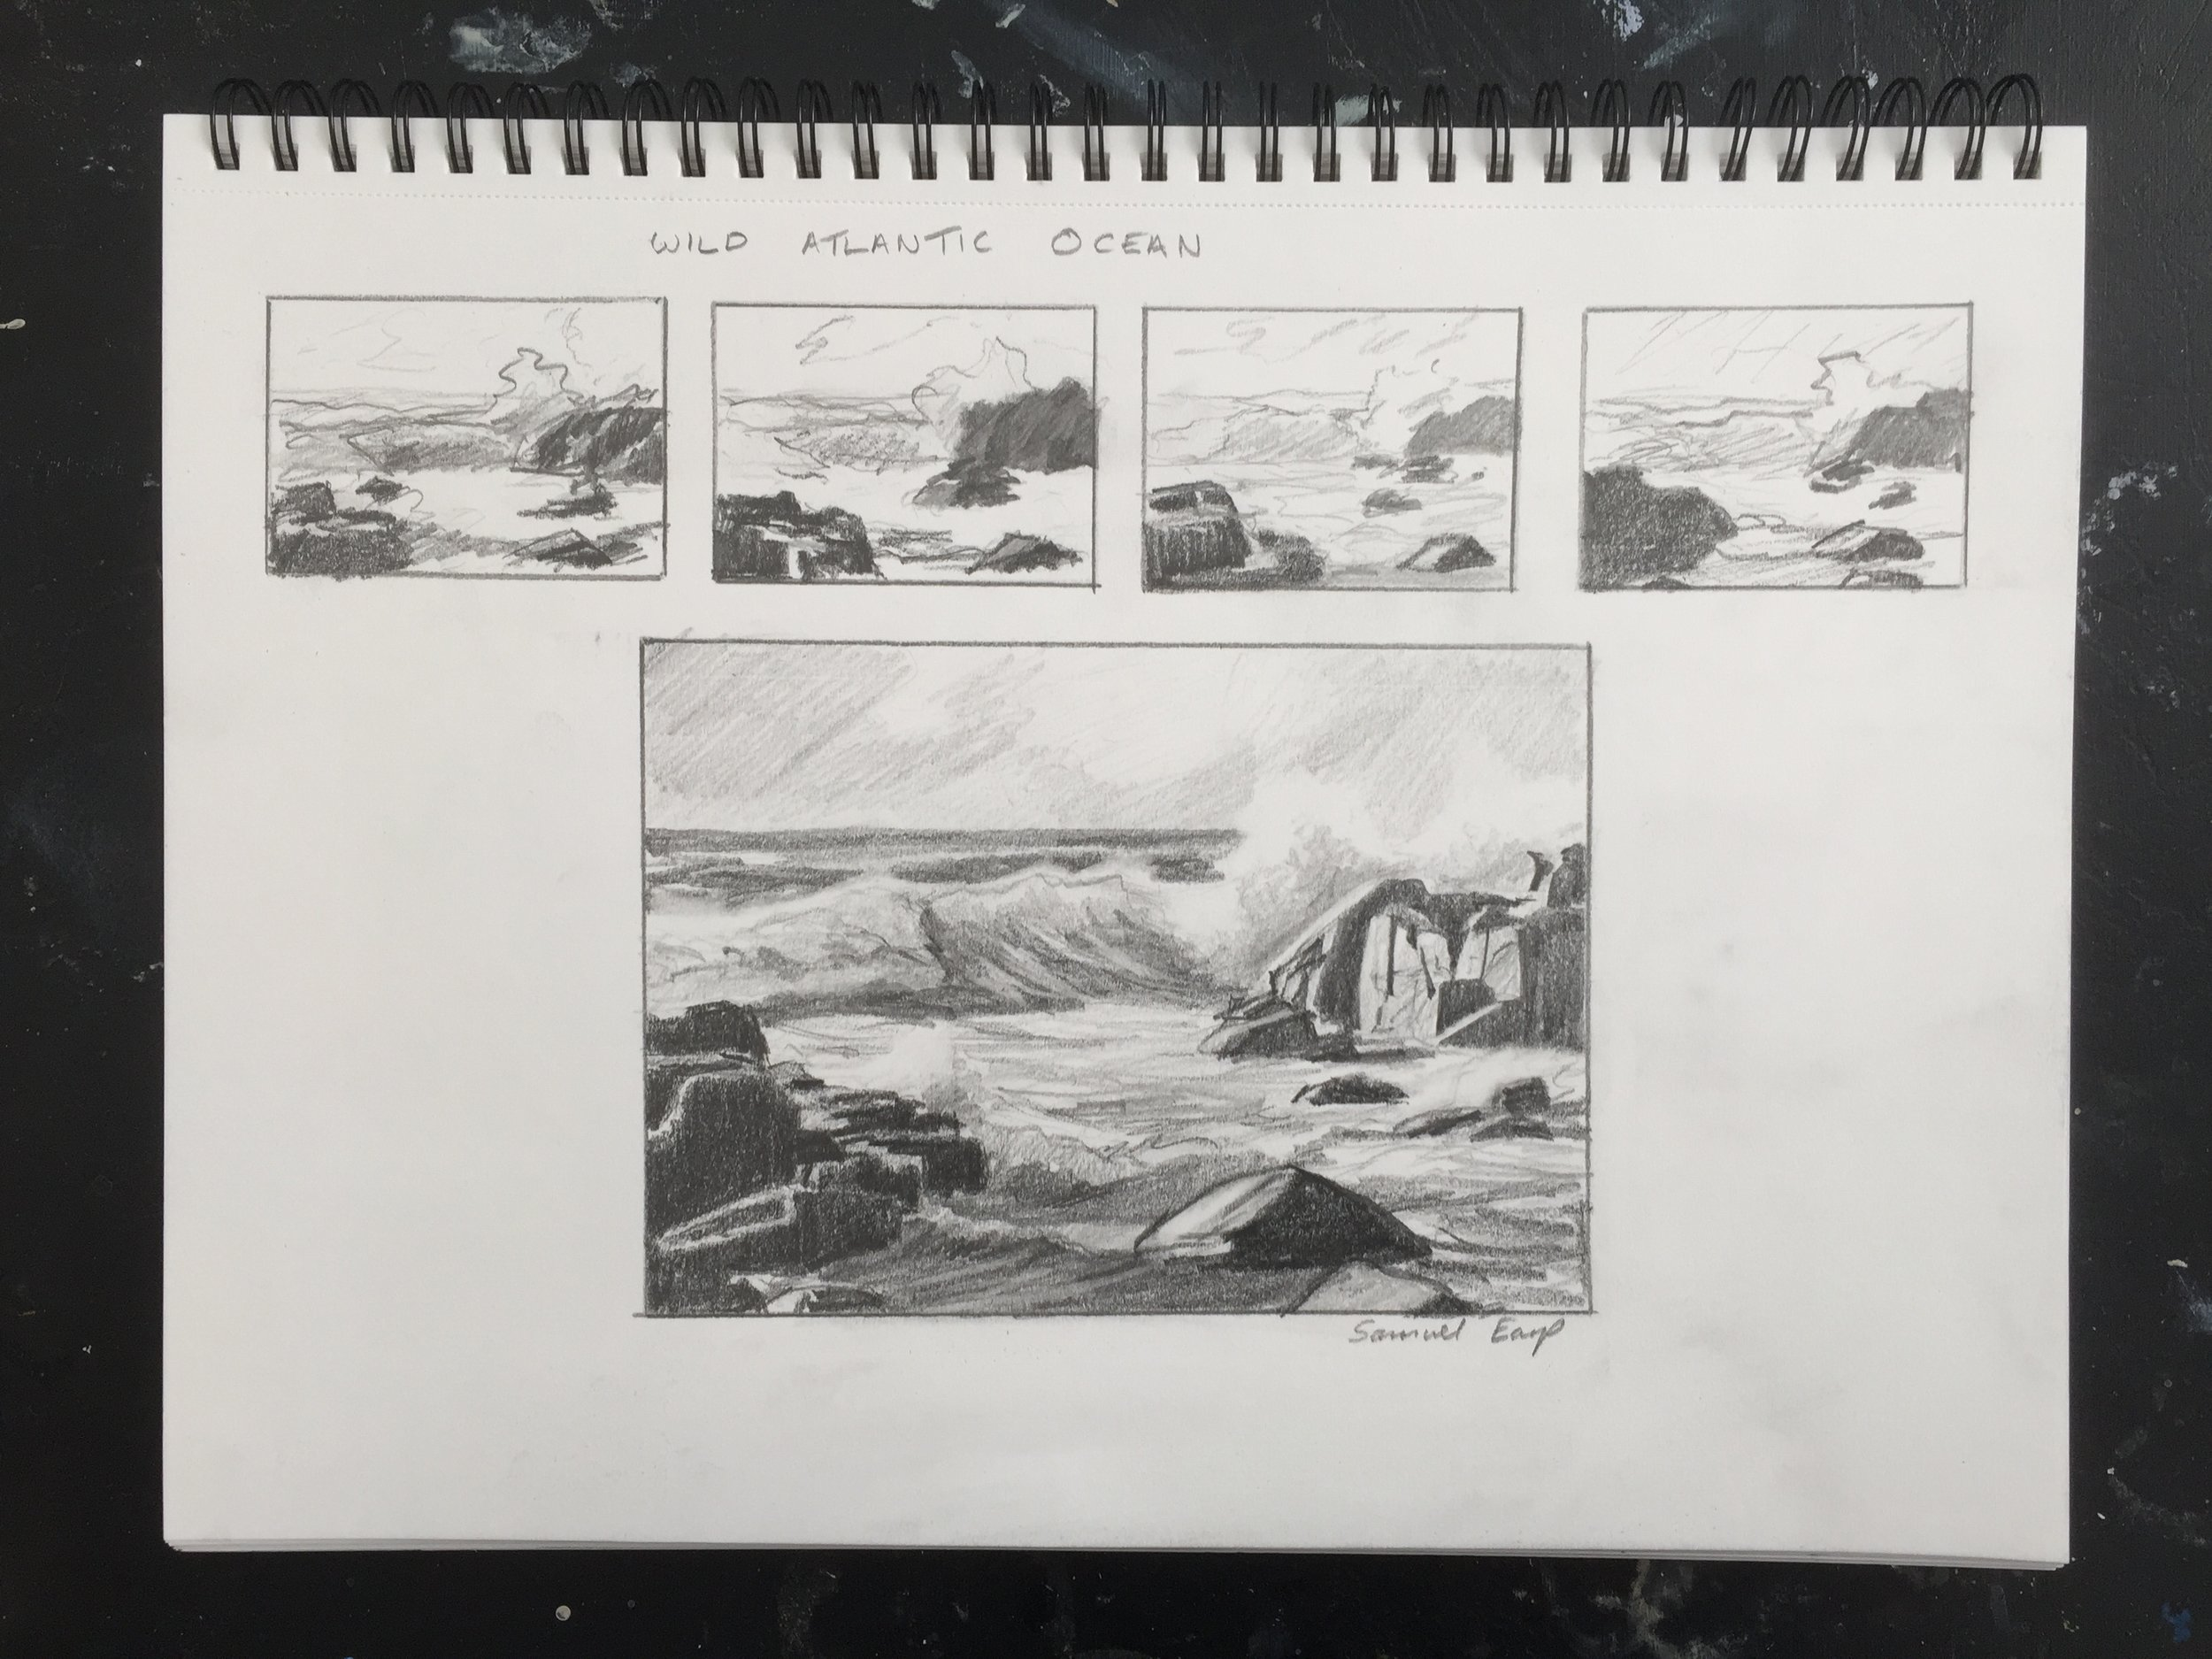 Wild Atlantic Ocean - pencil sketch - Samuel Earp.JPG